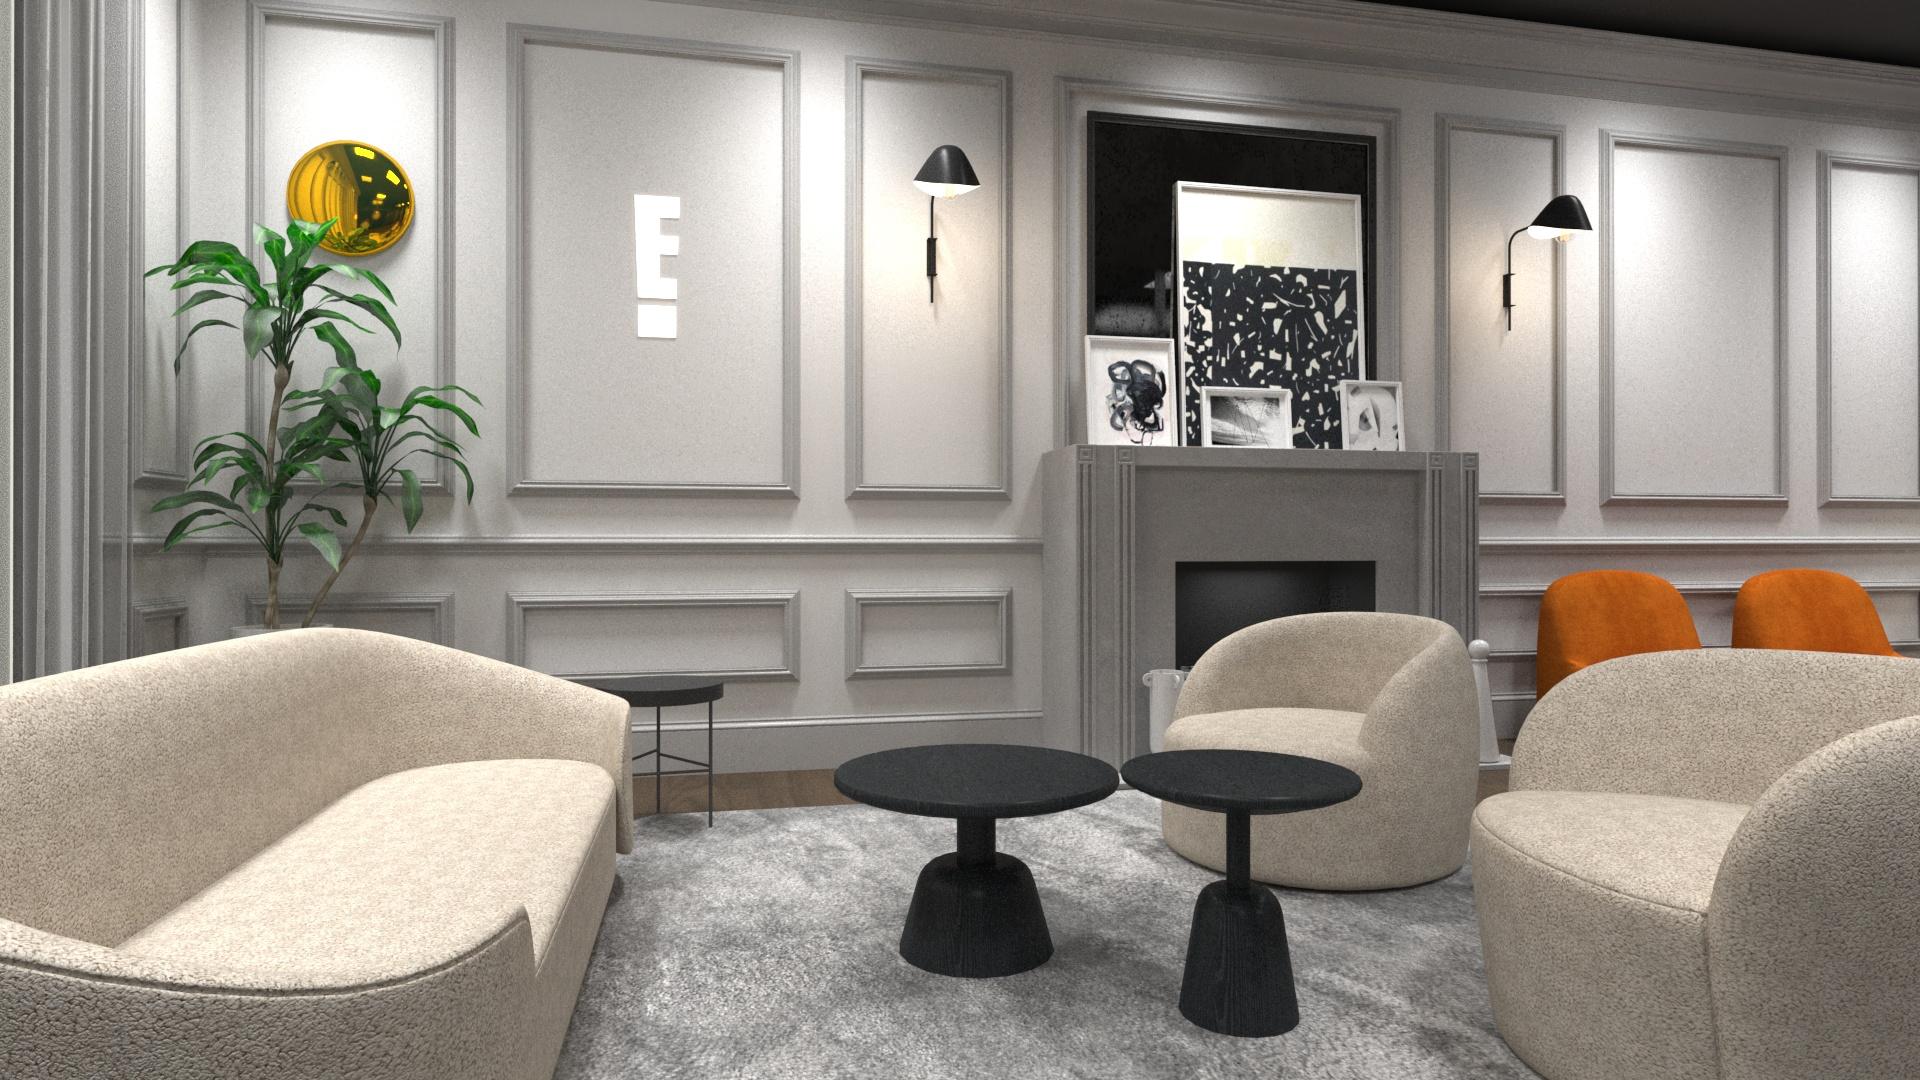 E_Studio_2019_183.jpg